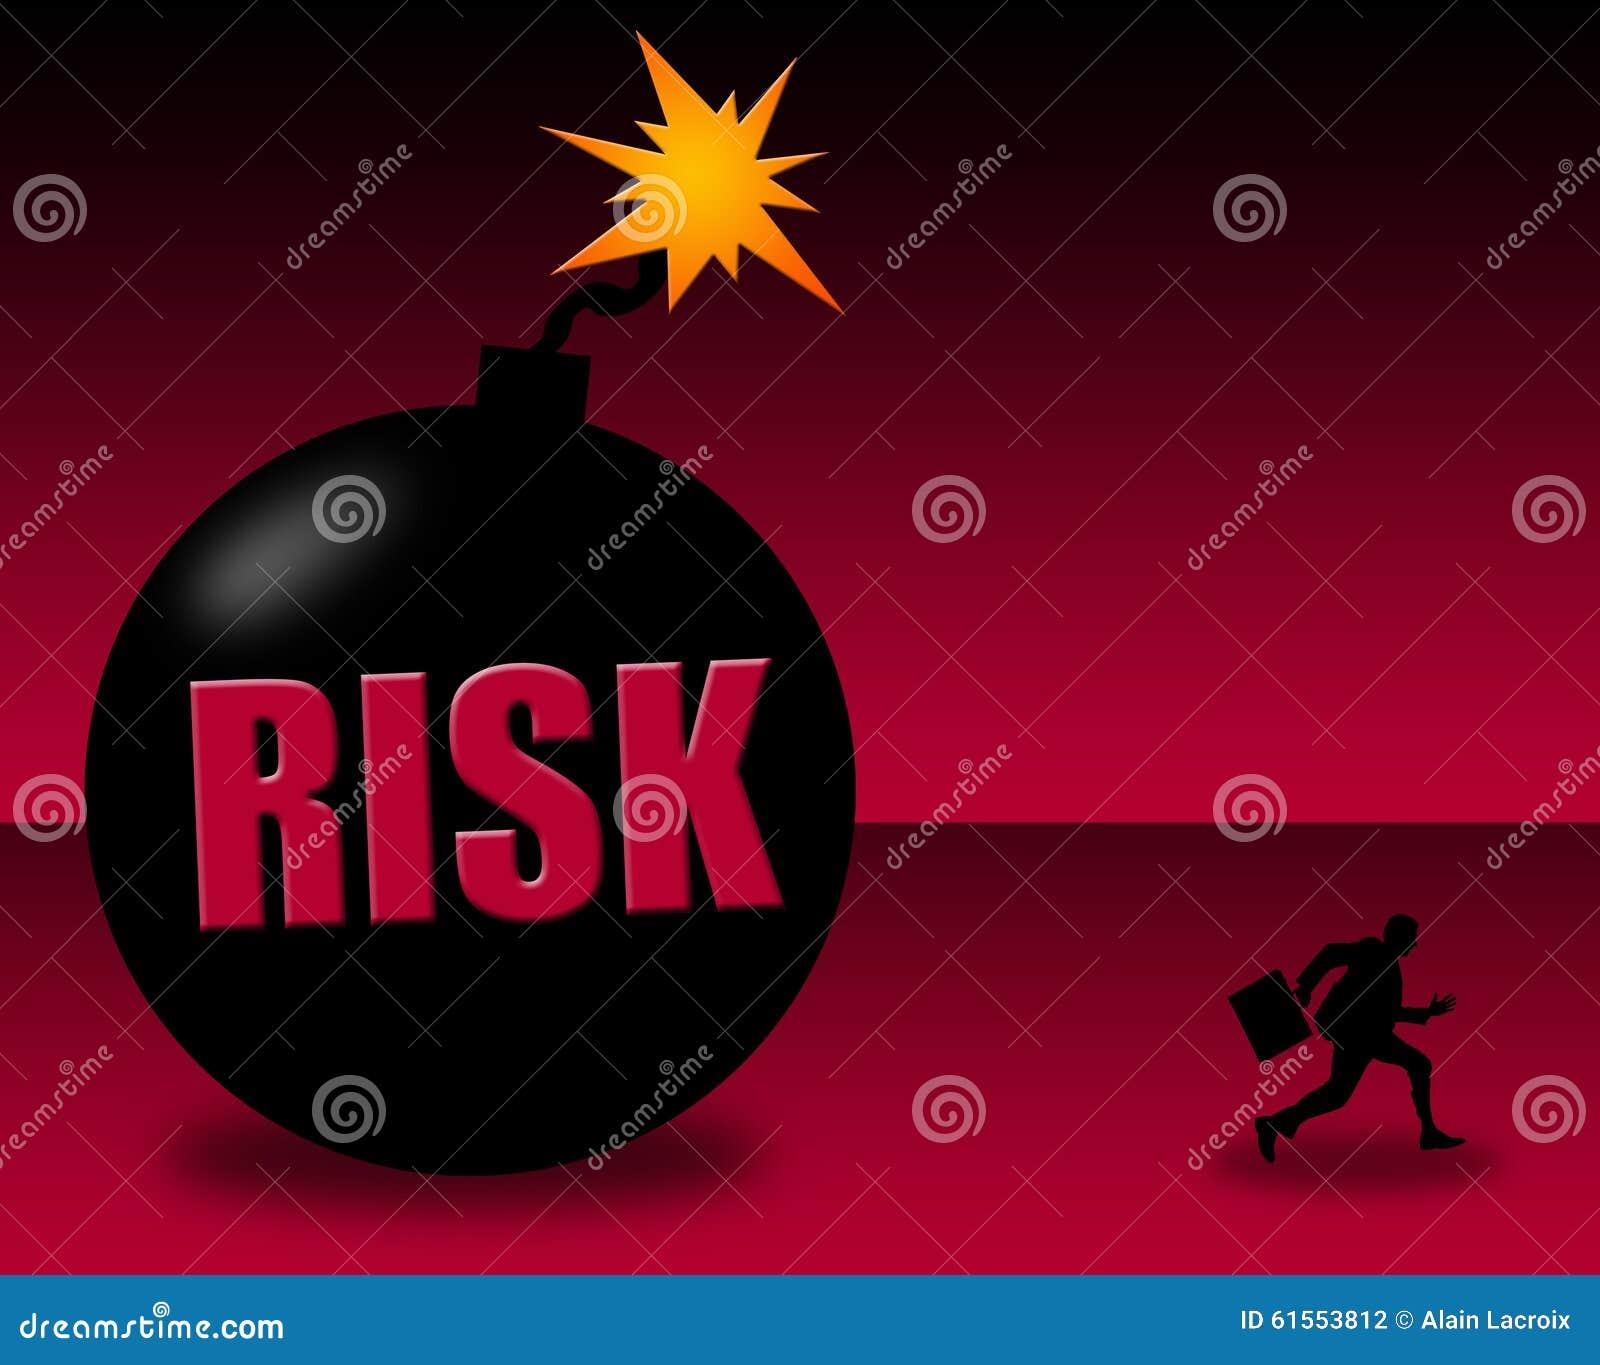 Ad alto rischio